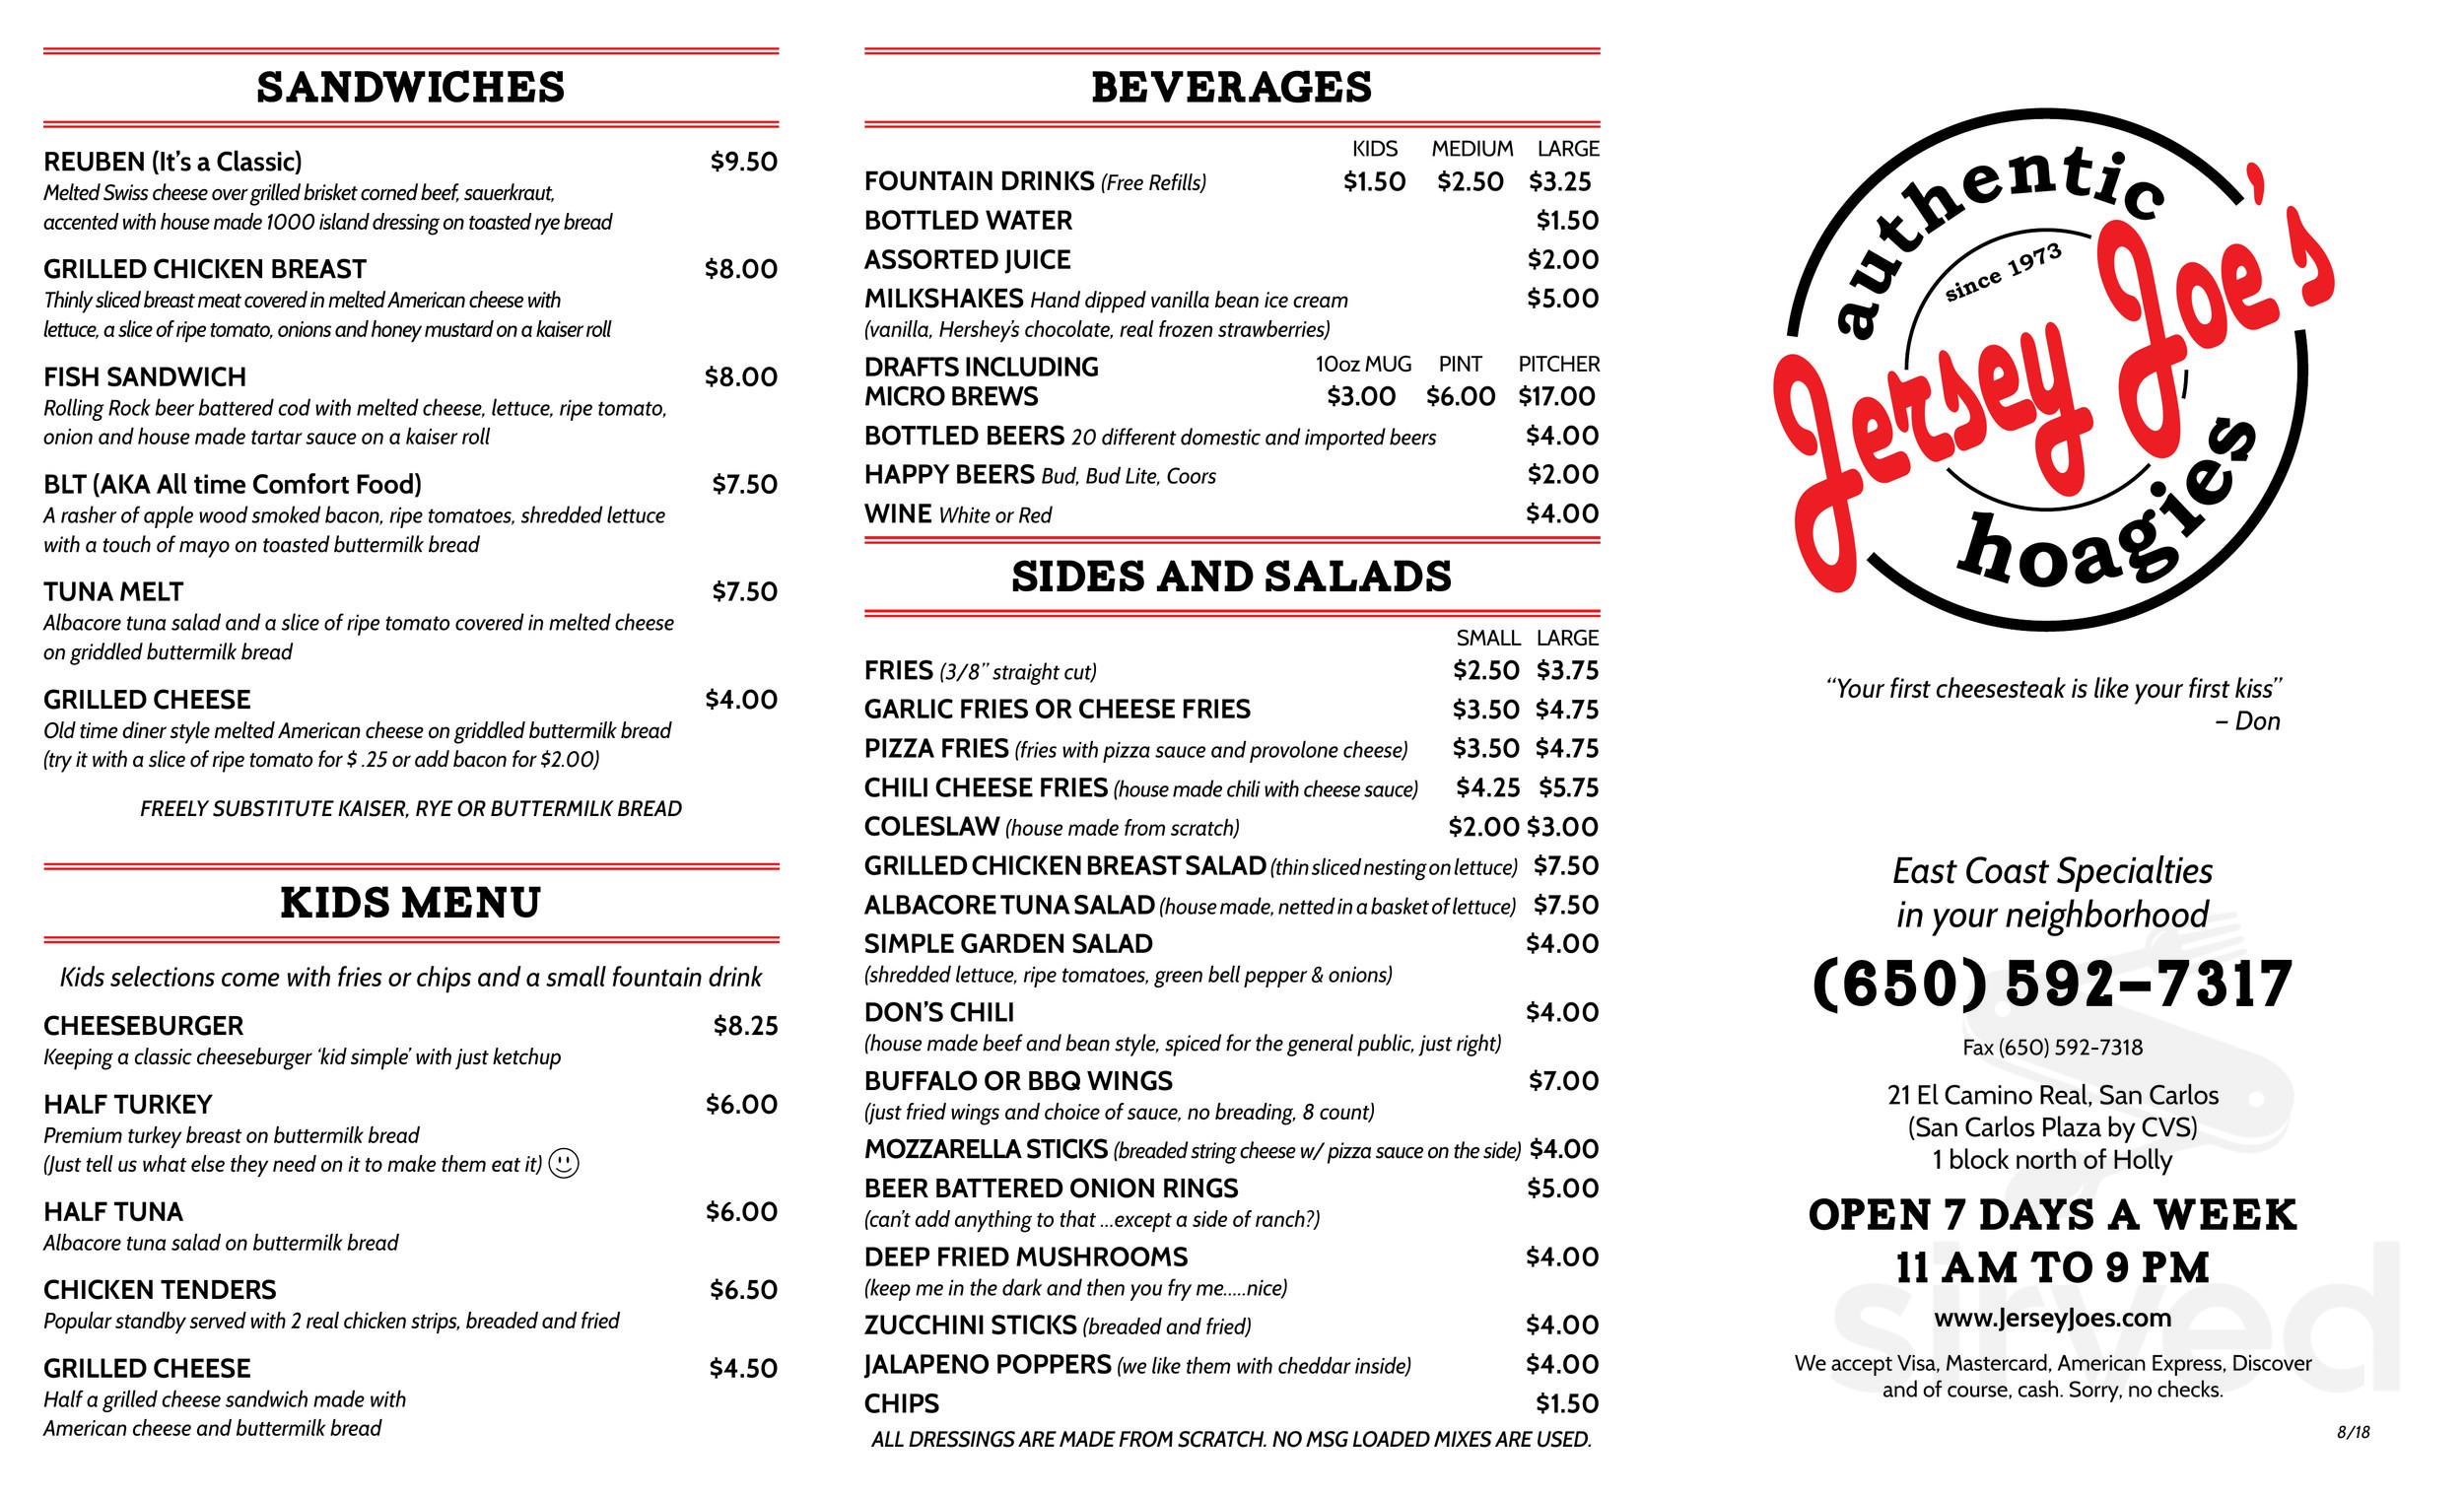 Jersey Joe's Cheesesteak menu in San Carlos, California, USA